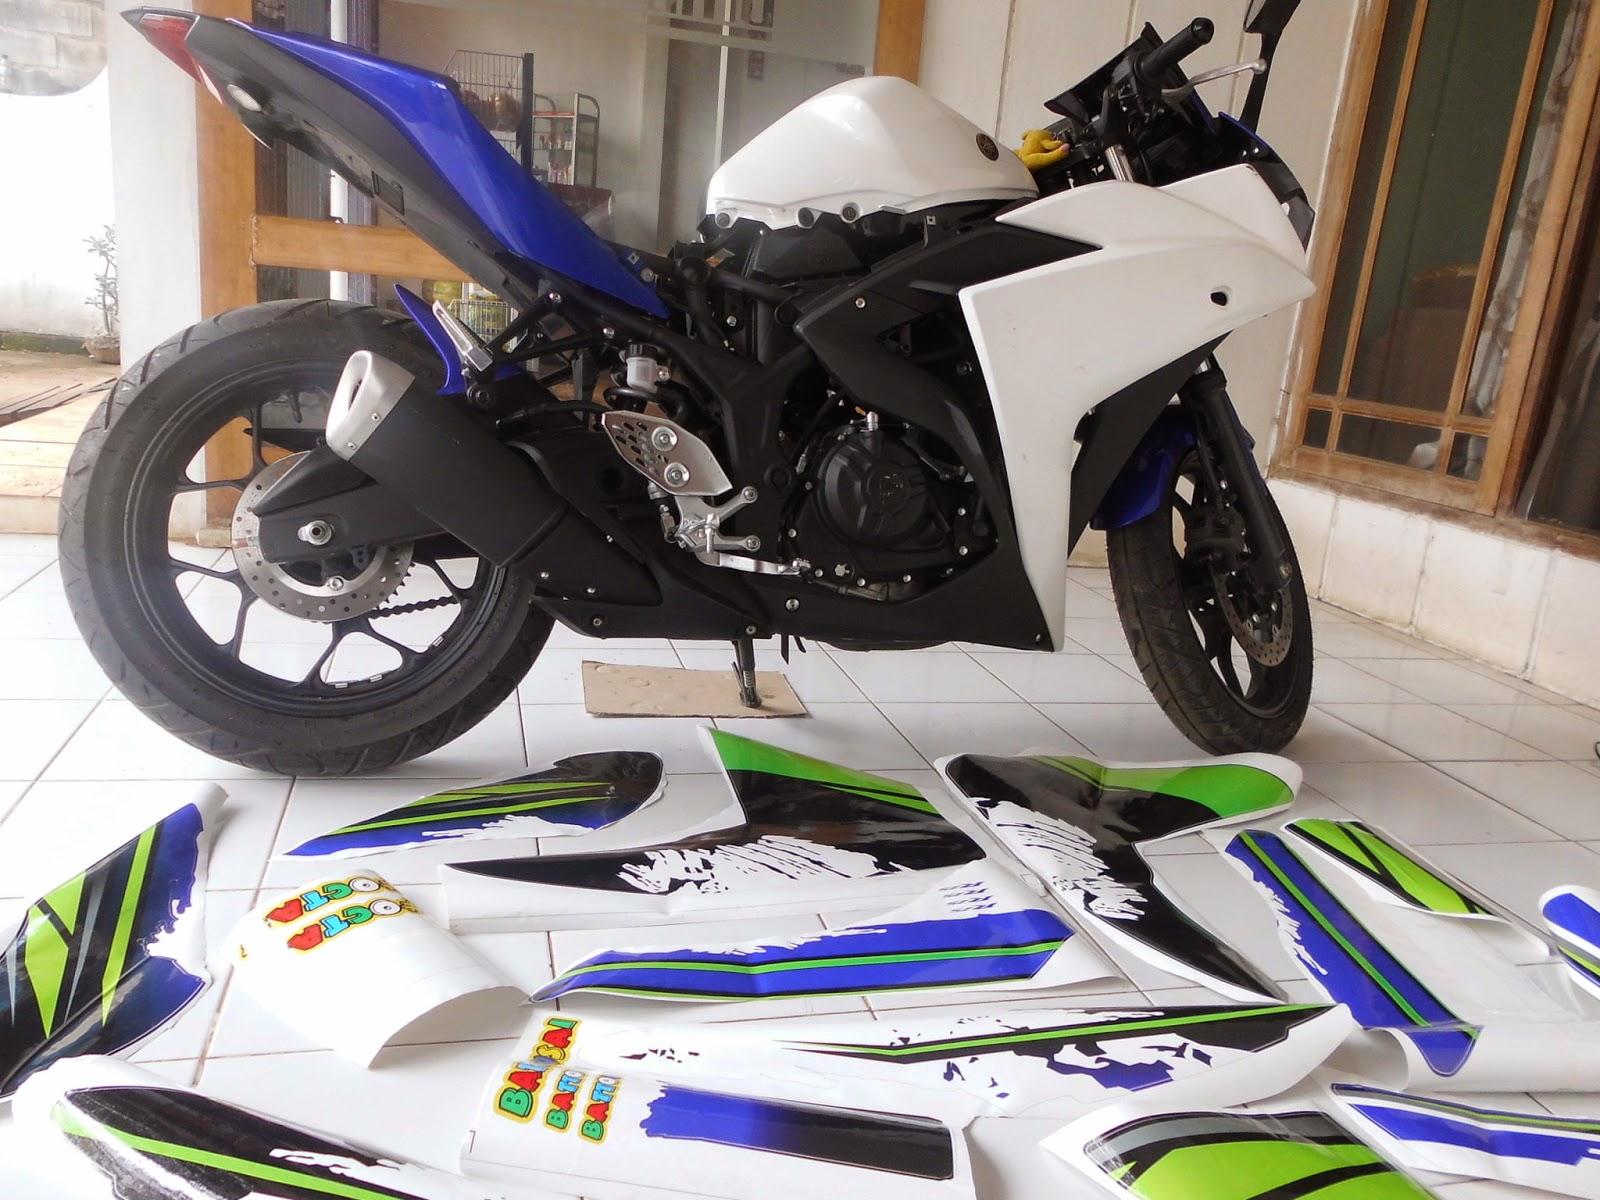 Modifikasi custom striping motor yamaha r25 dengan motif motogp by digitive